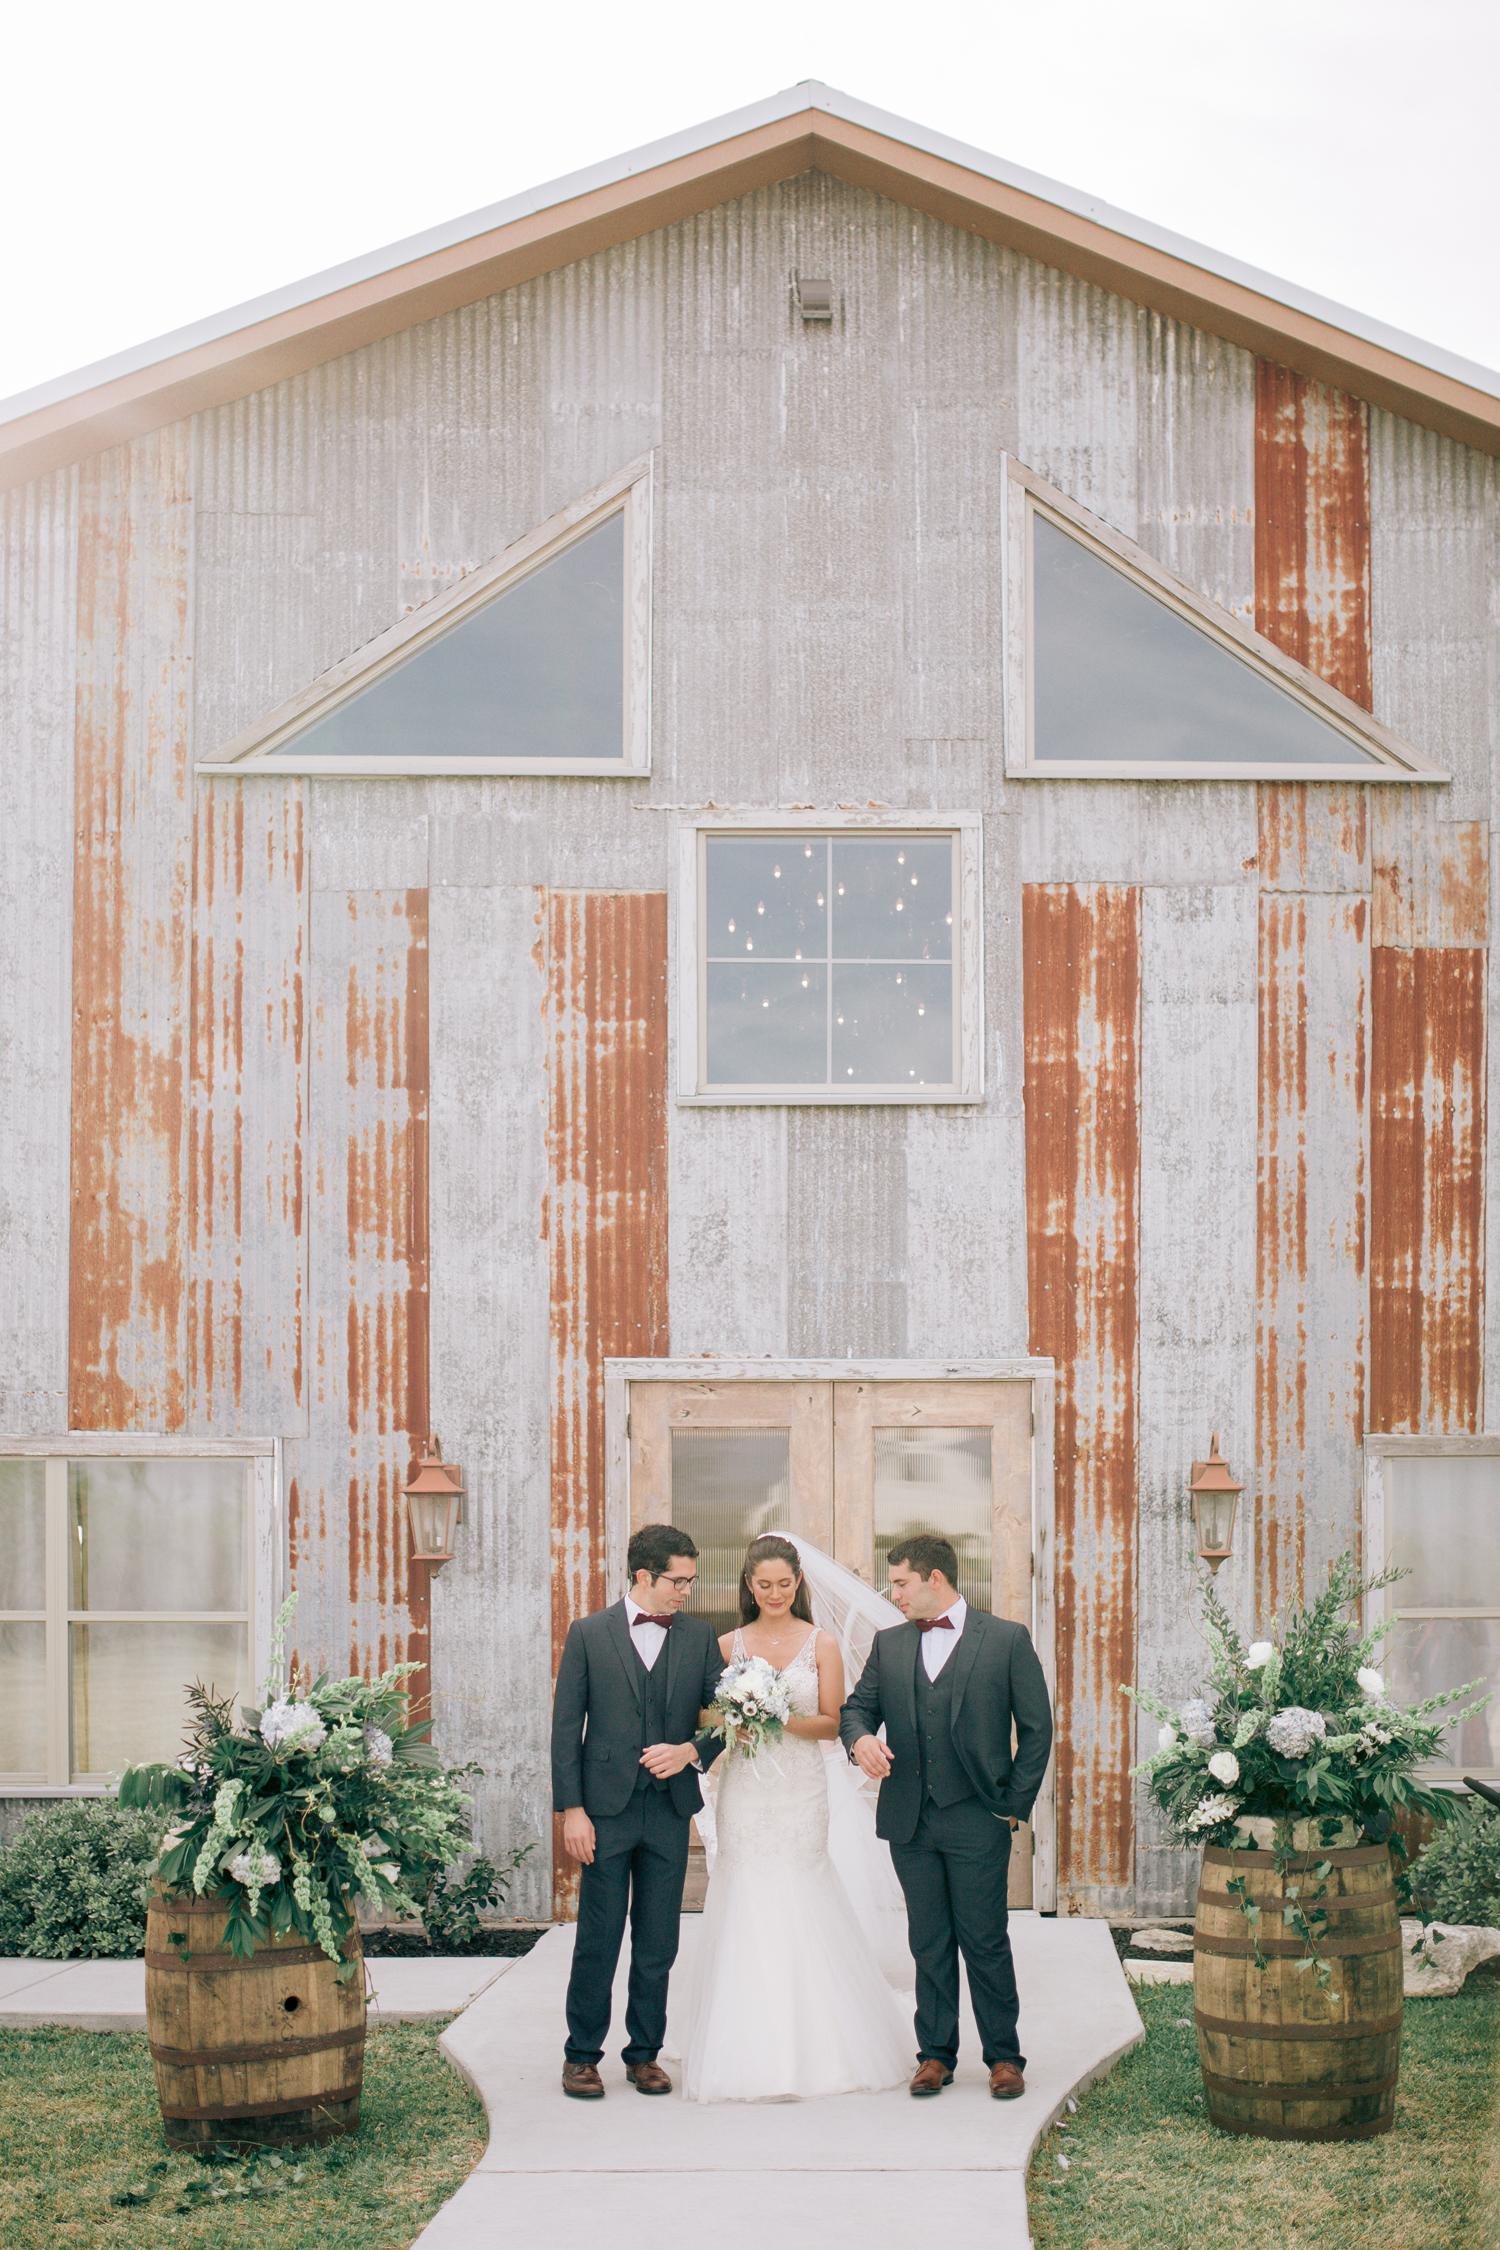 alaa-marzouk-photography-rgvweddingphotographer-rio-grande-valley-mathis-wedding-bridal-bride-san-antonio-portrait-weddings-mcallen-92.jpg